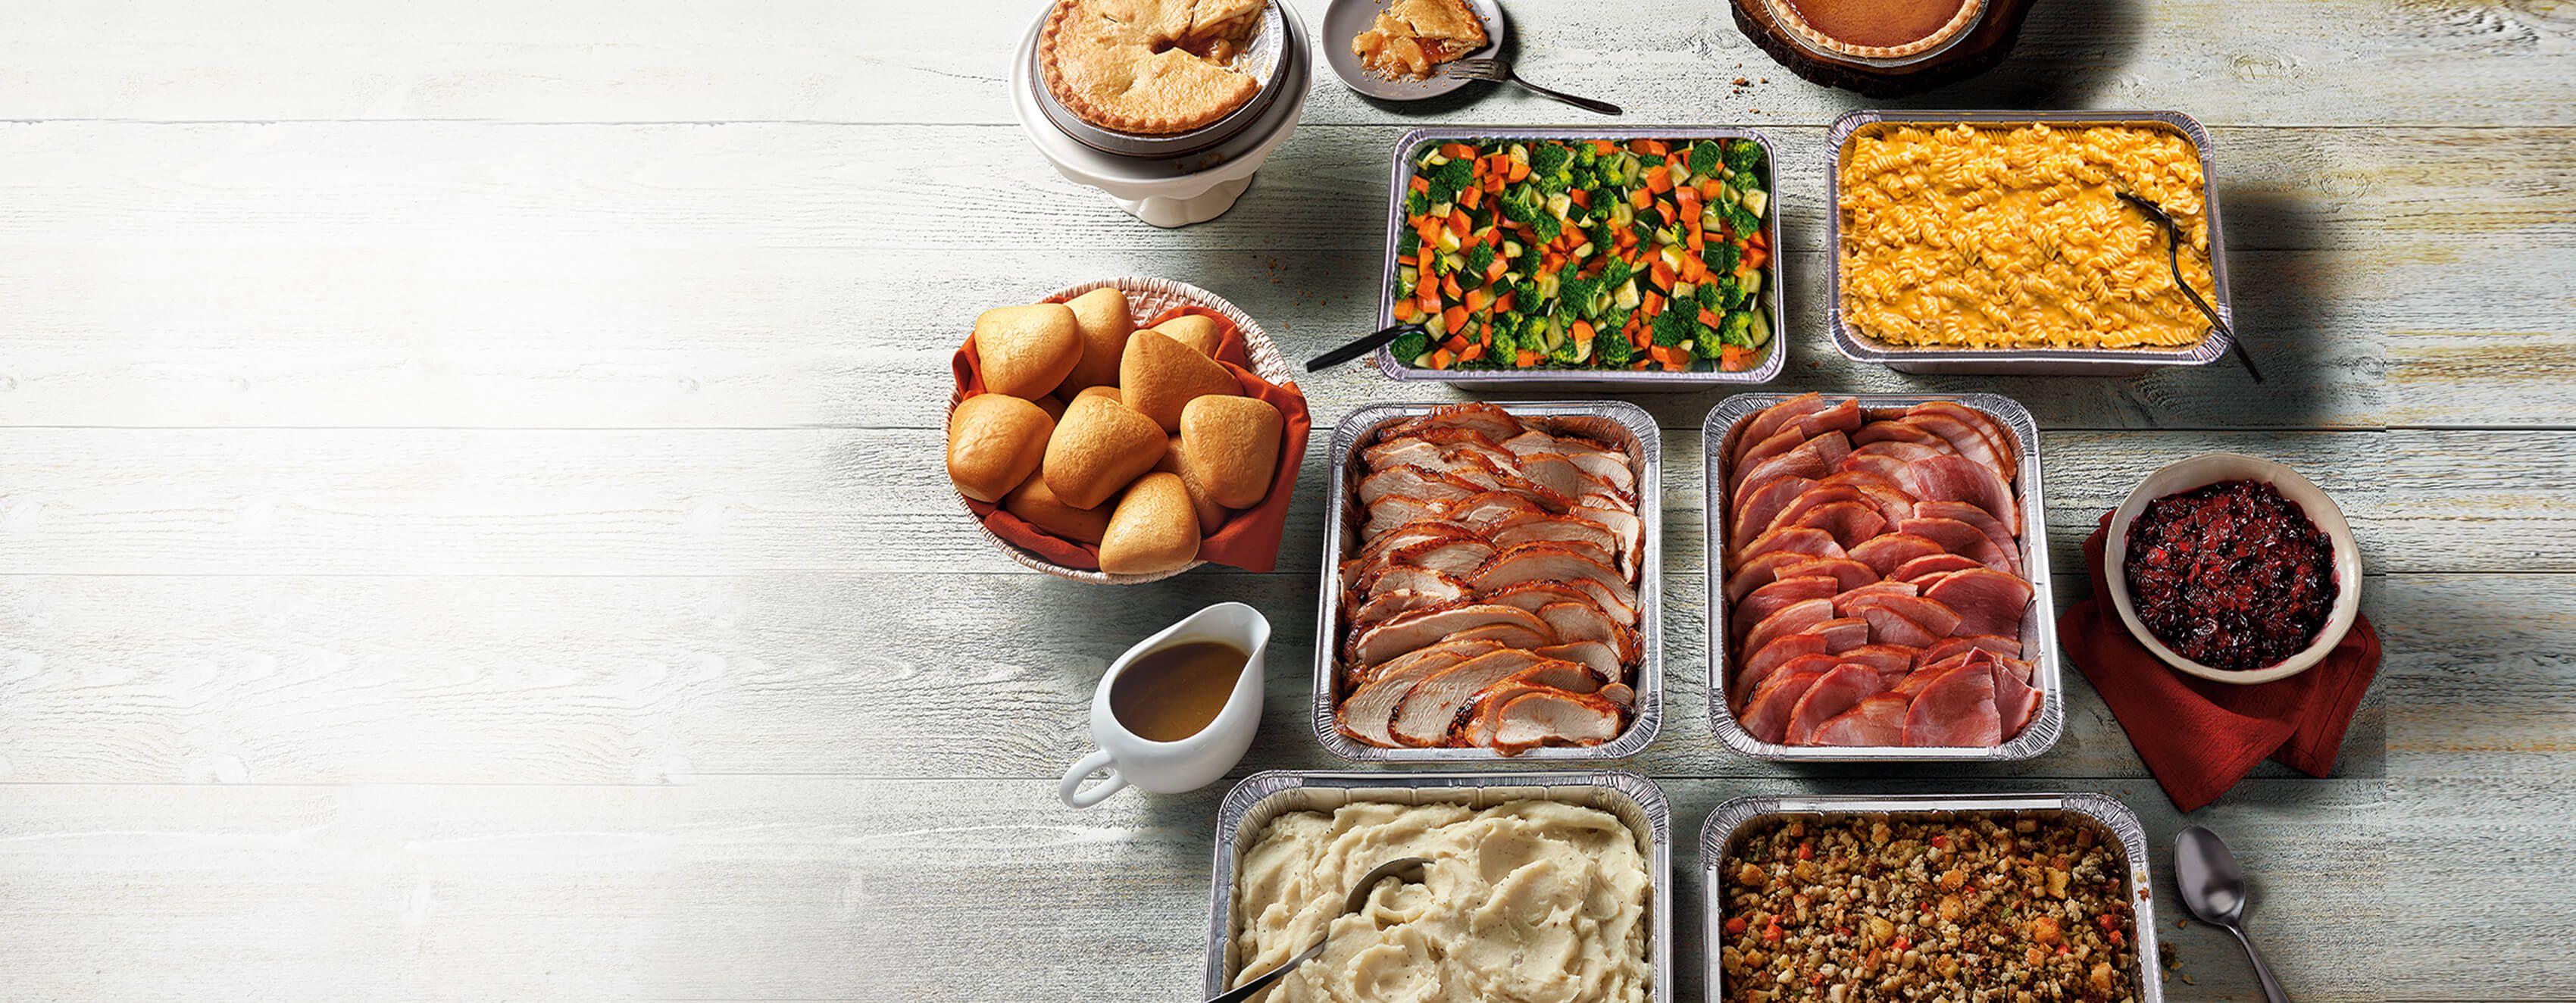 Holiday Meals Catering Restaurants Boston Market